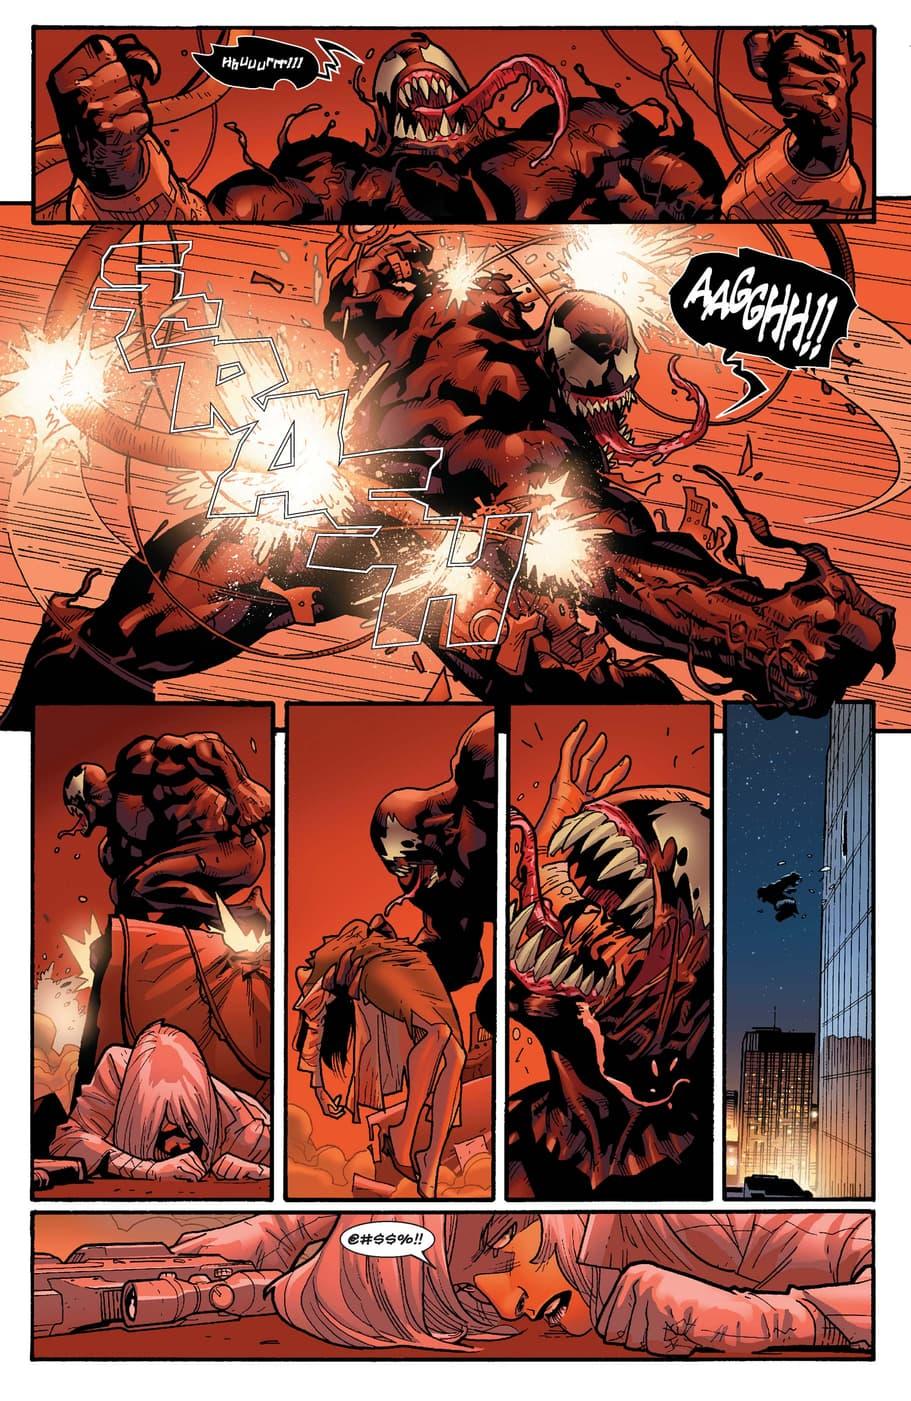 Ultimate Spider-Man (2000) #125